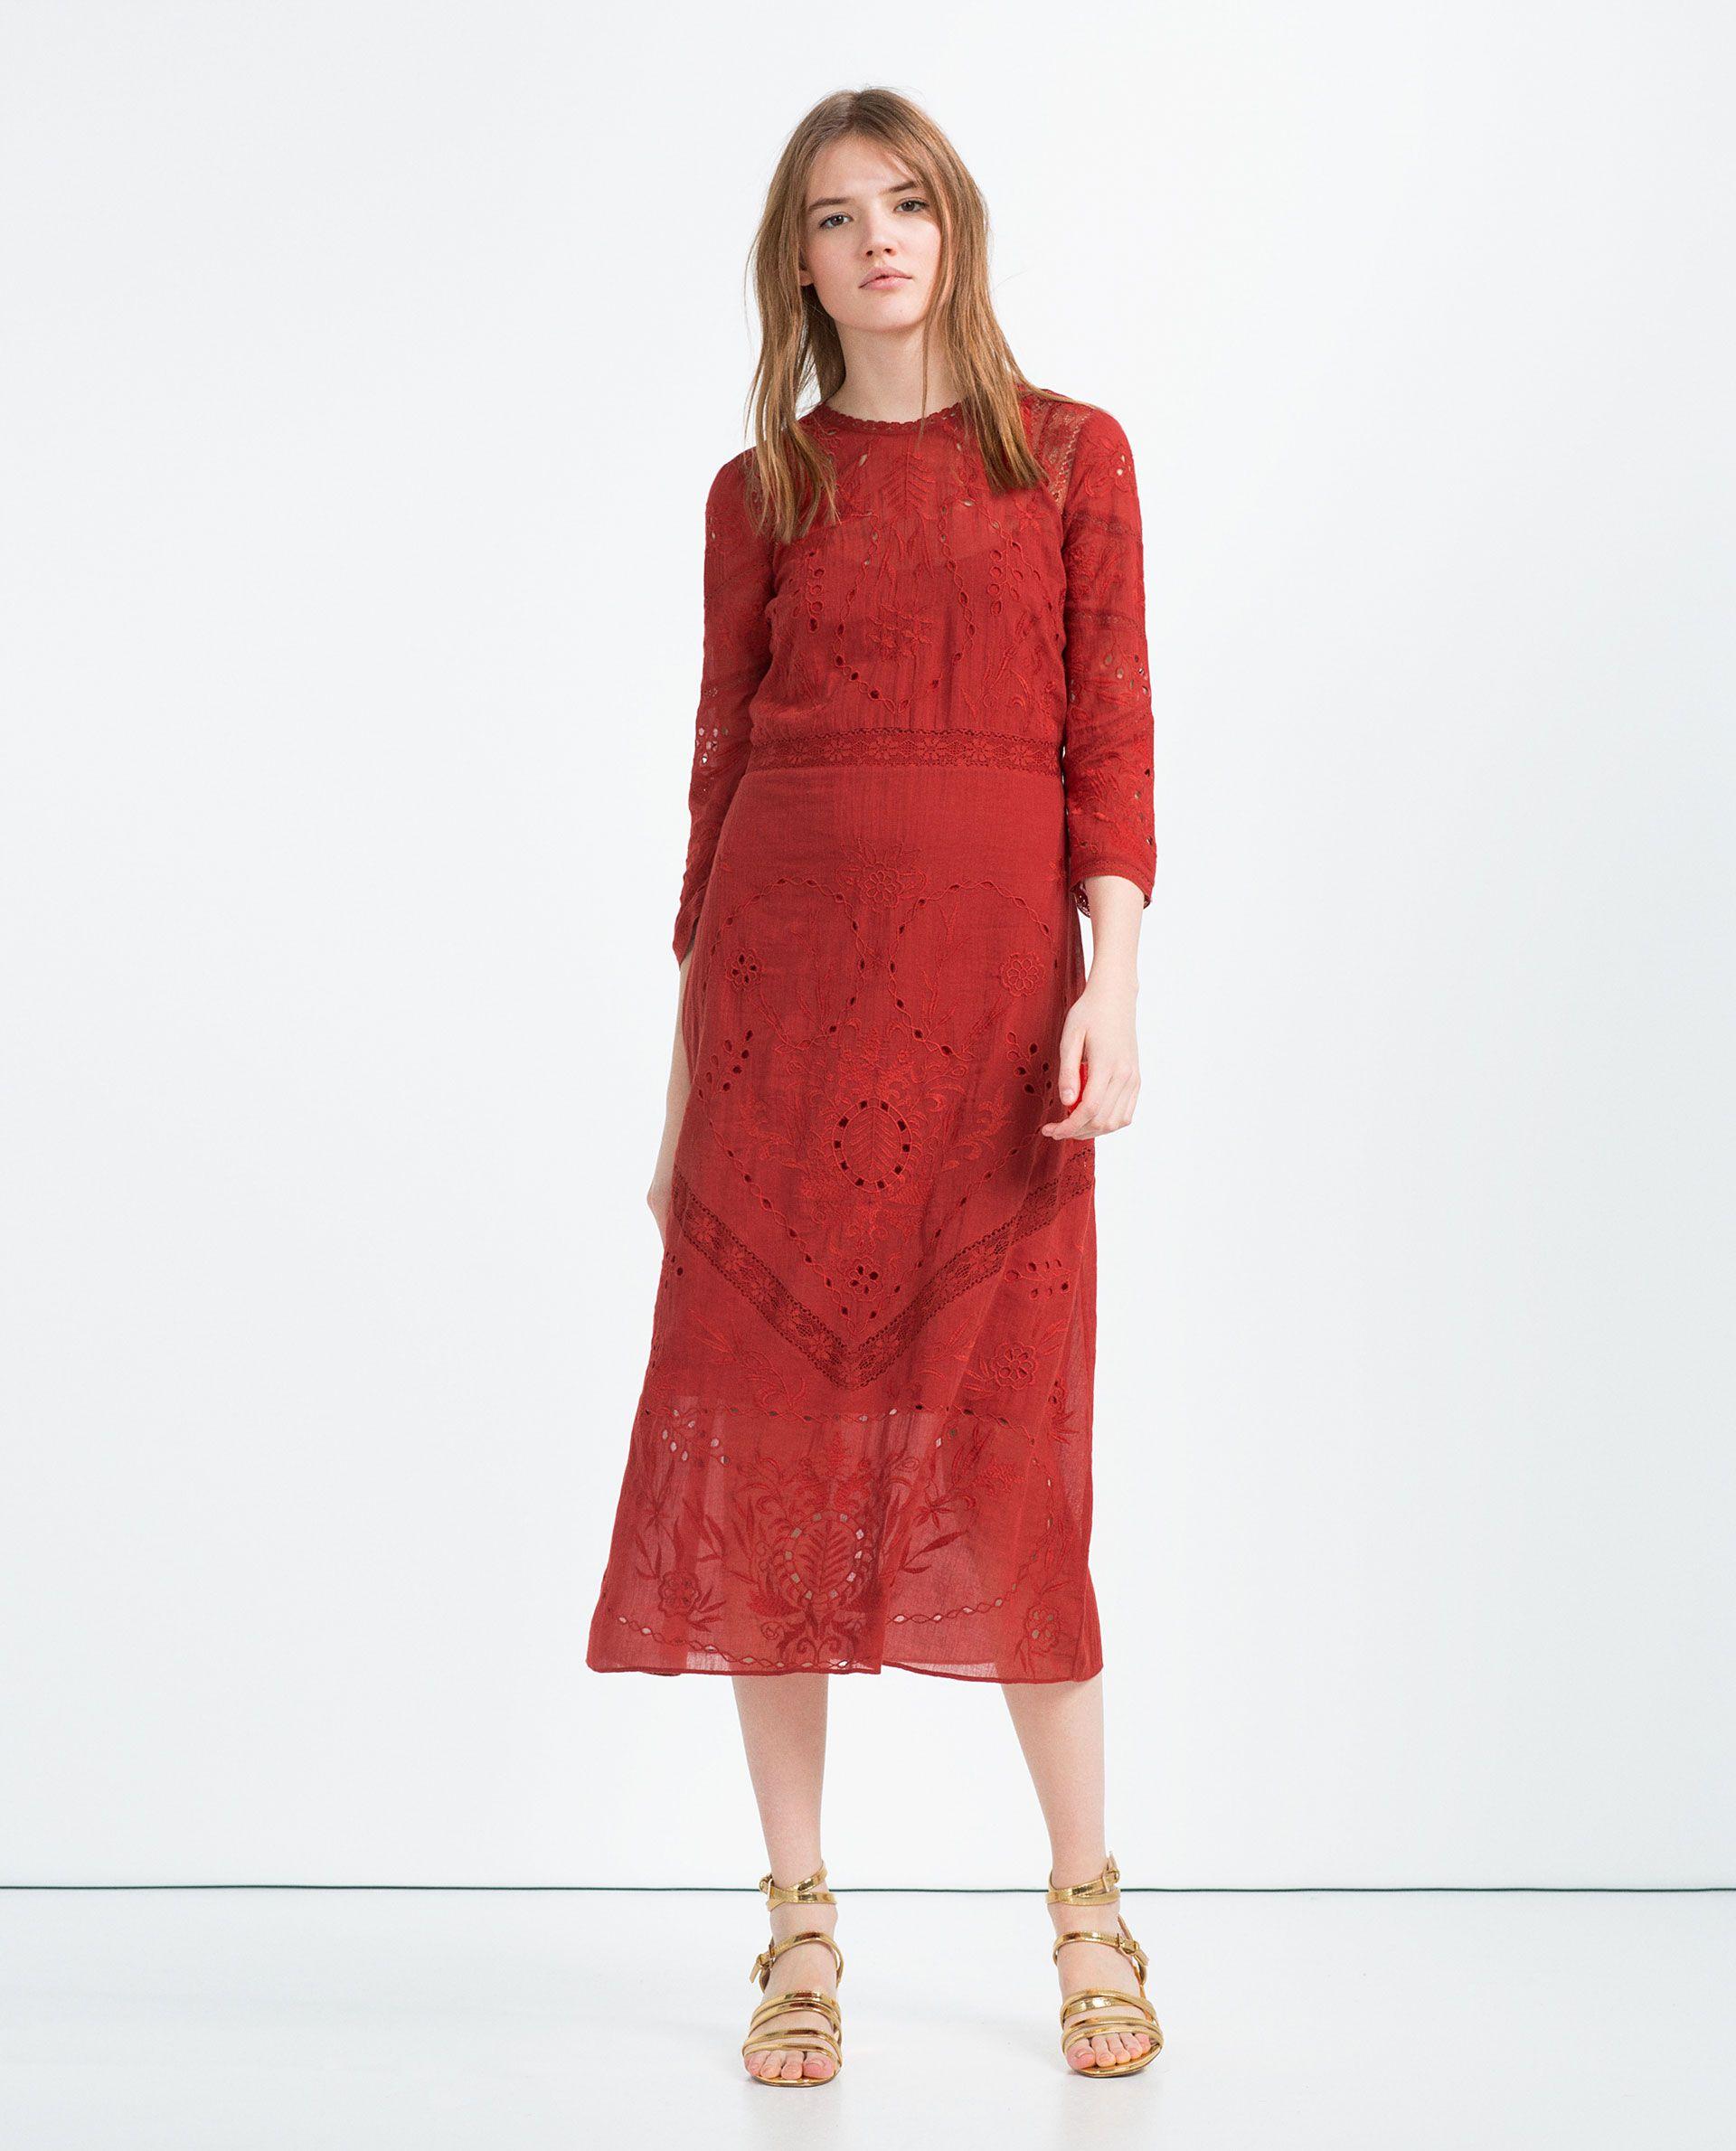 Zara cotton embroidered dress closet wishlist pinterest ss16 zara cotton embroidered dress ombrellifo Images